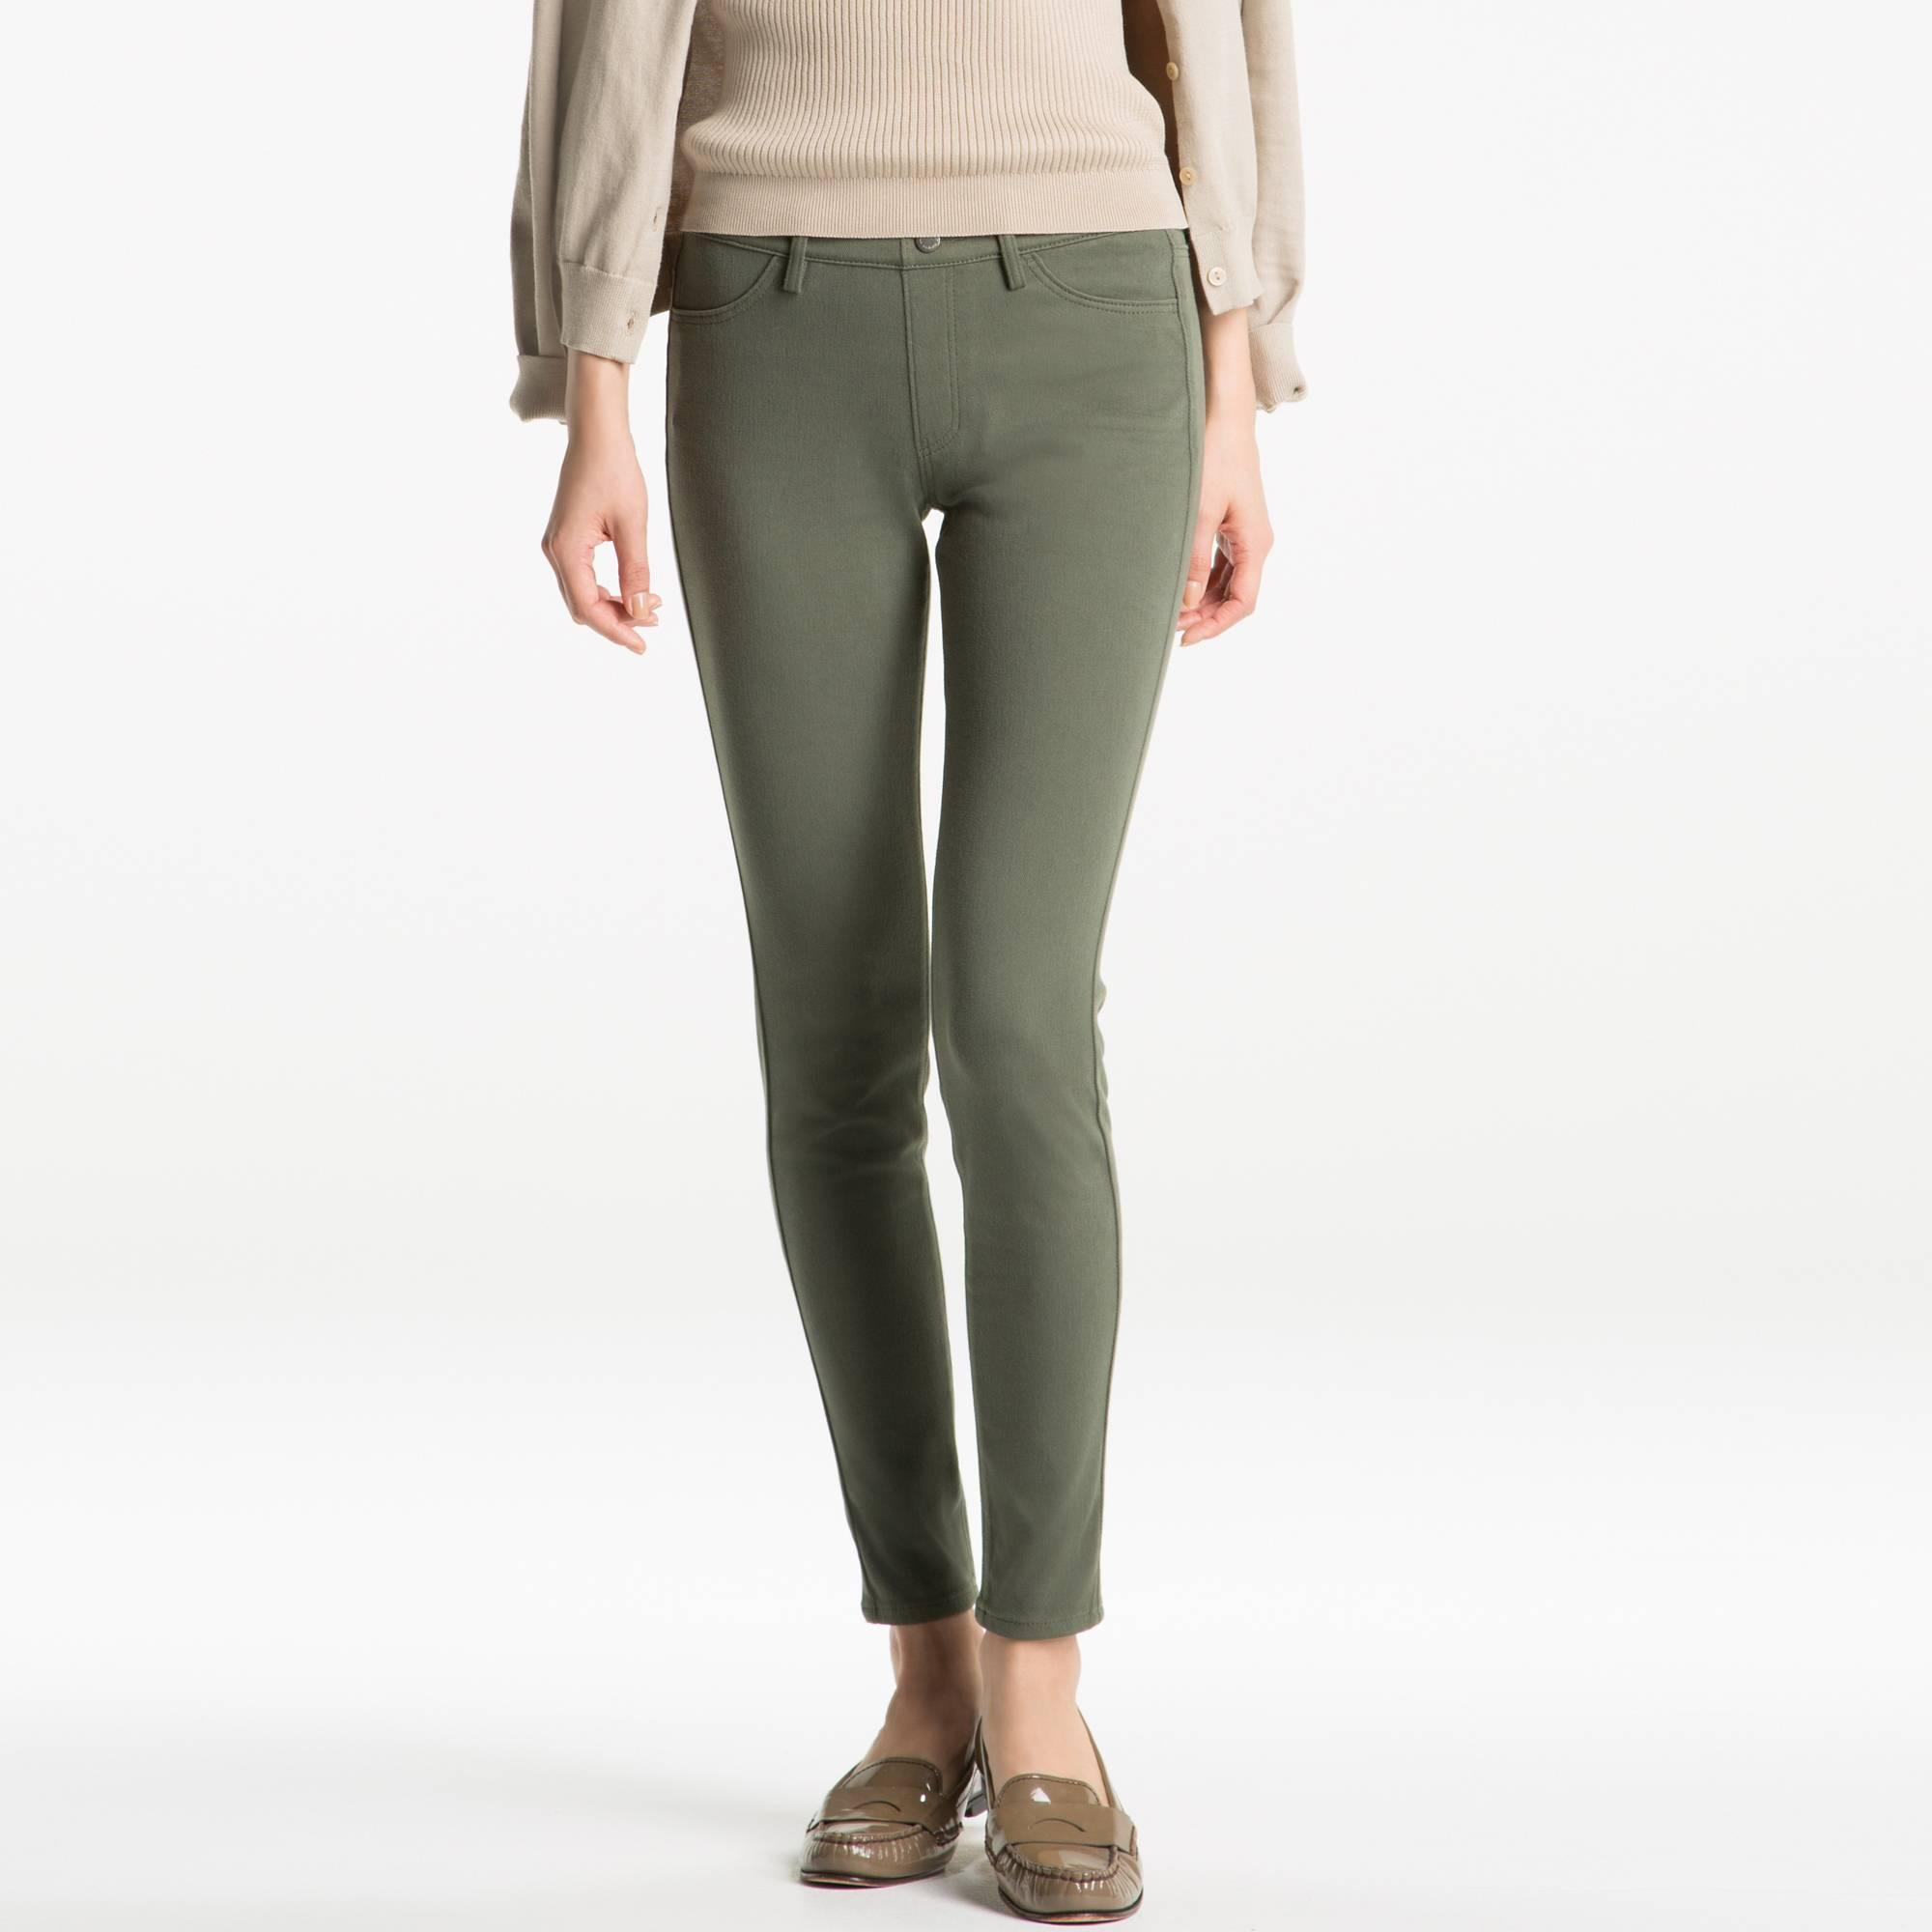 c378aa4c410422 Uniqlo Legging Pants Canada - Best Style Pants Man And Woman